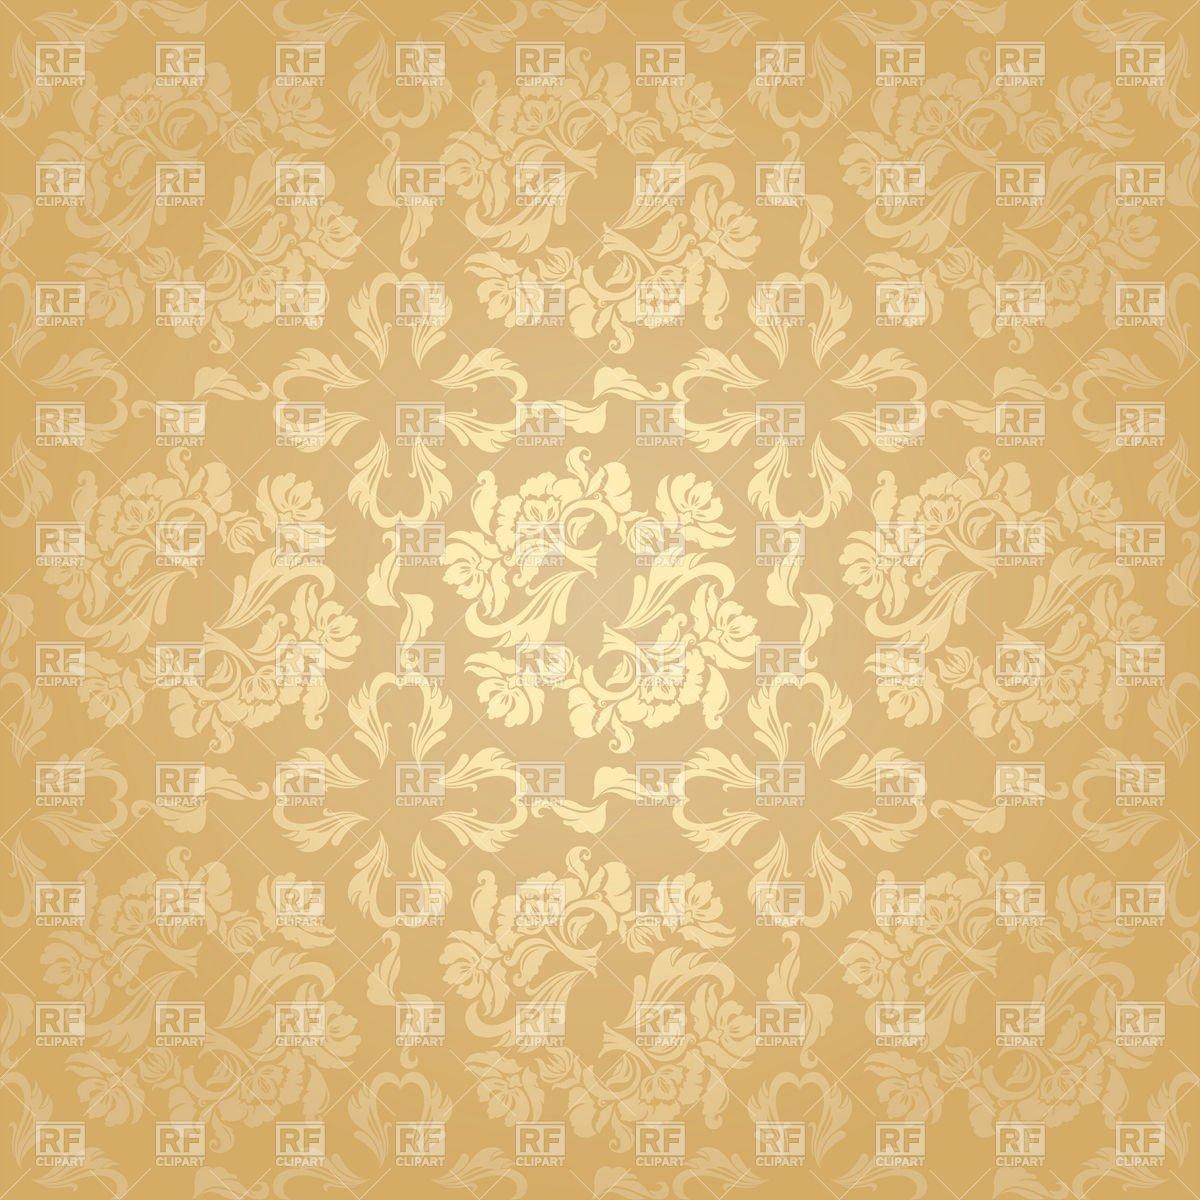 Seamless beige floral victorian wallpaper Backgrounds Textures 1200x1200